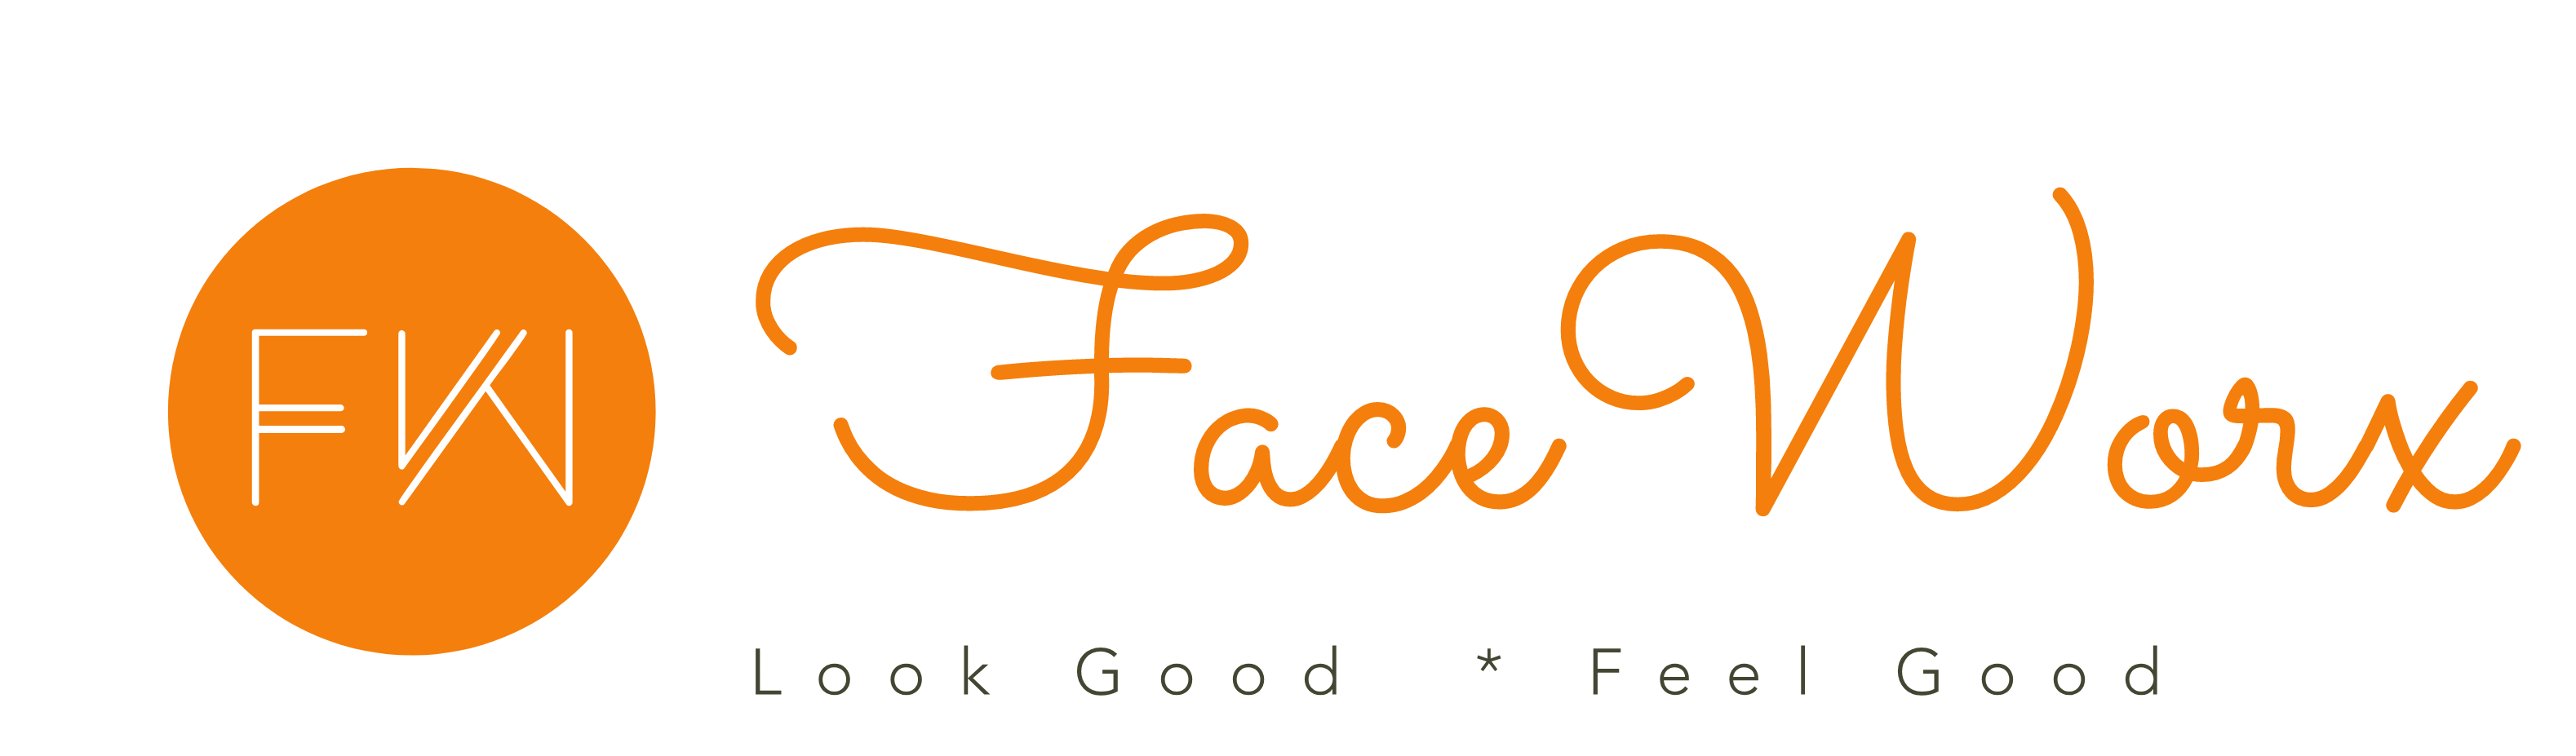 The FaceWorx